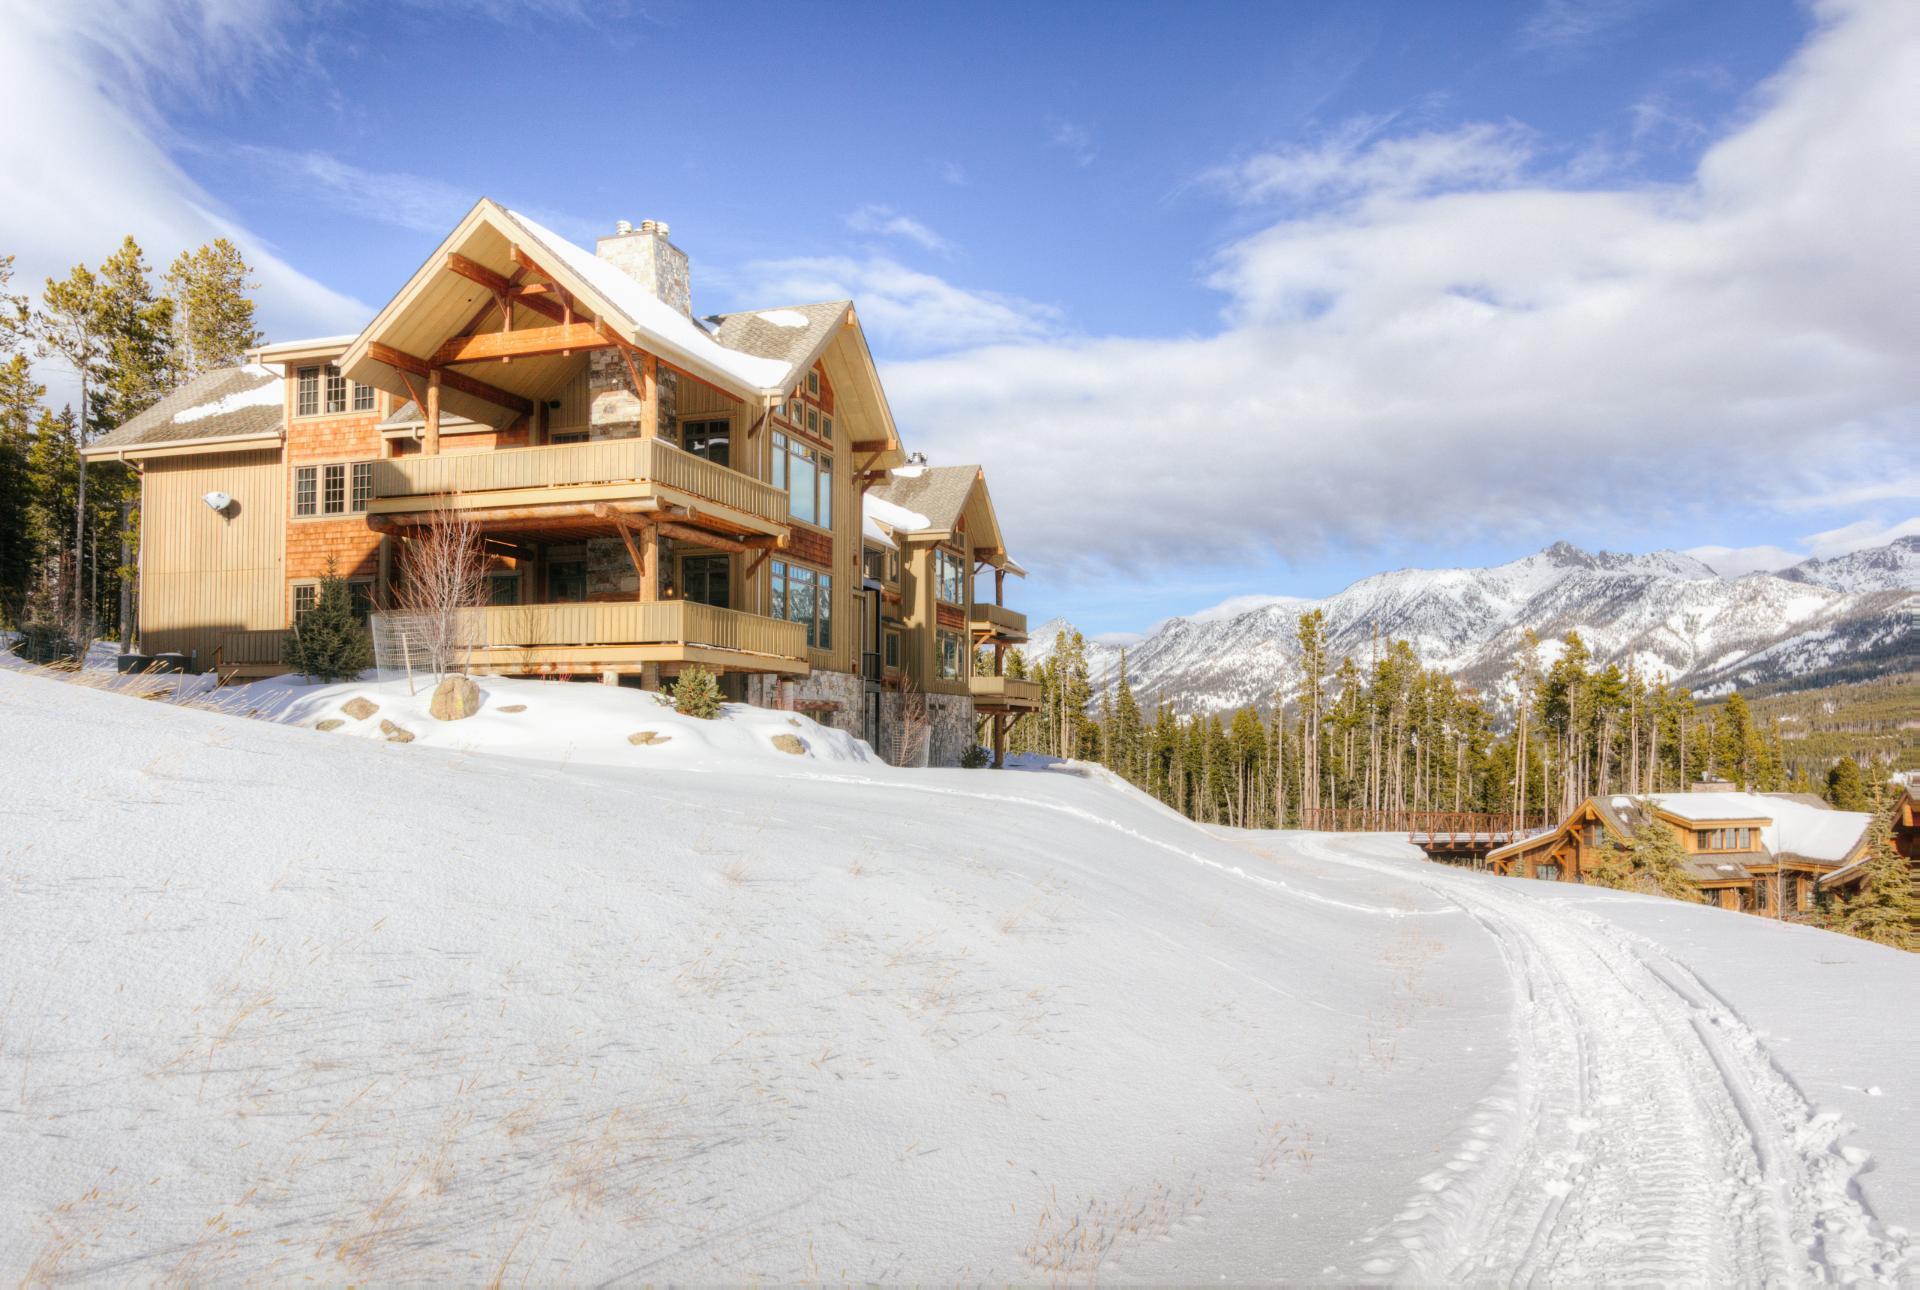 Big Sky Vacation Cabin And Home Rentals Big Sky Vacation